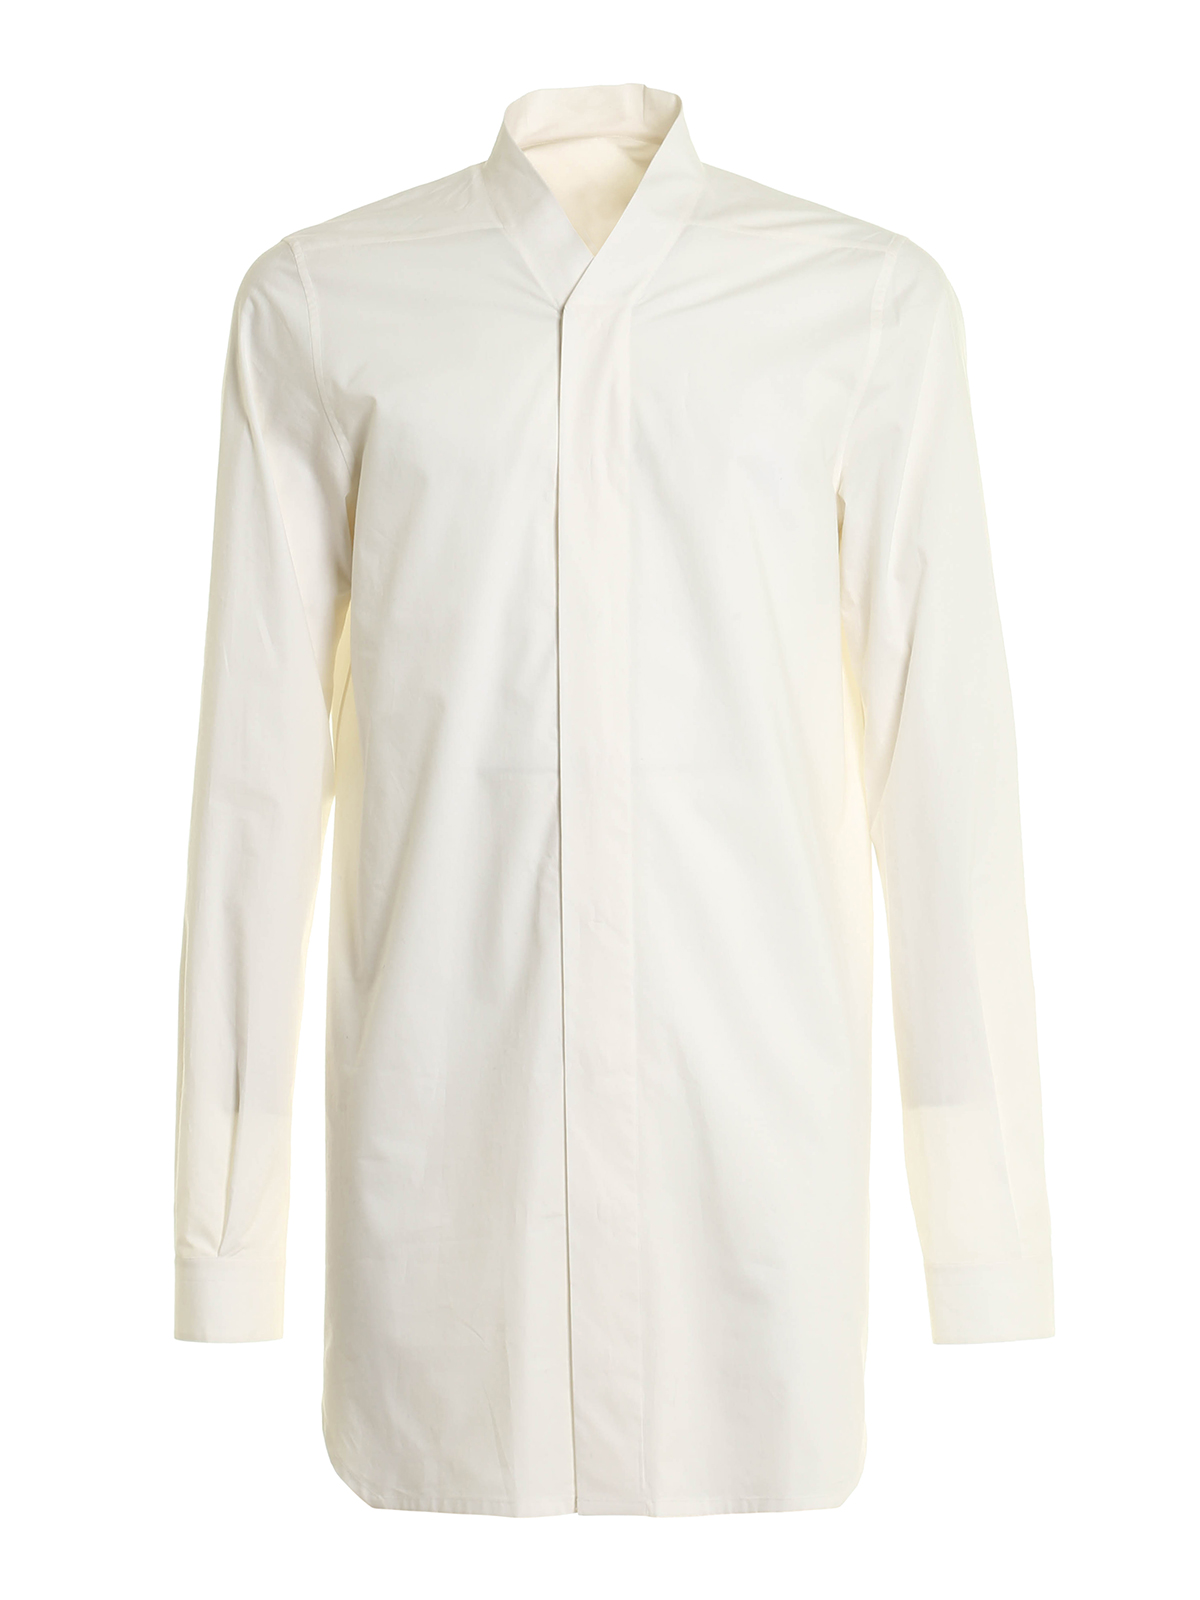 Cotton poplin long shirt by rick owens shirts ikrix for What is a poplin shirt